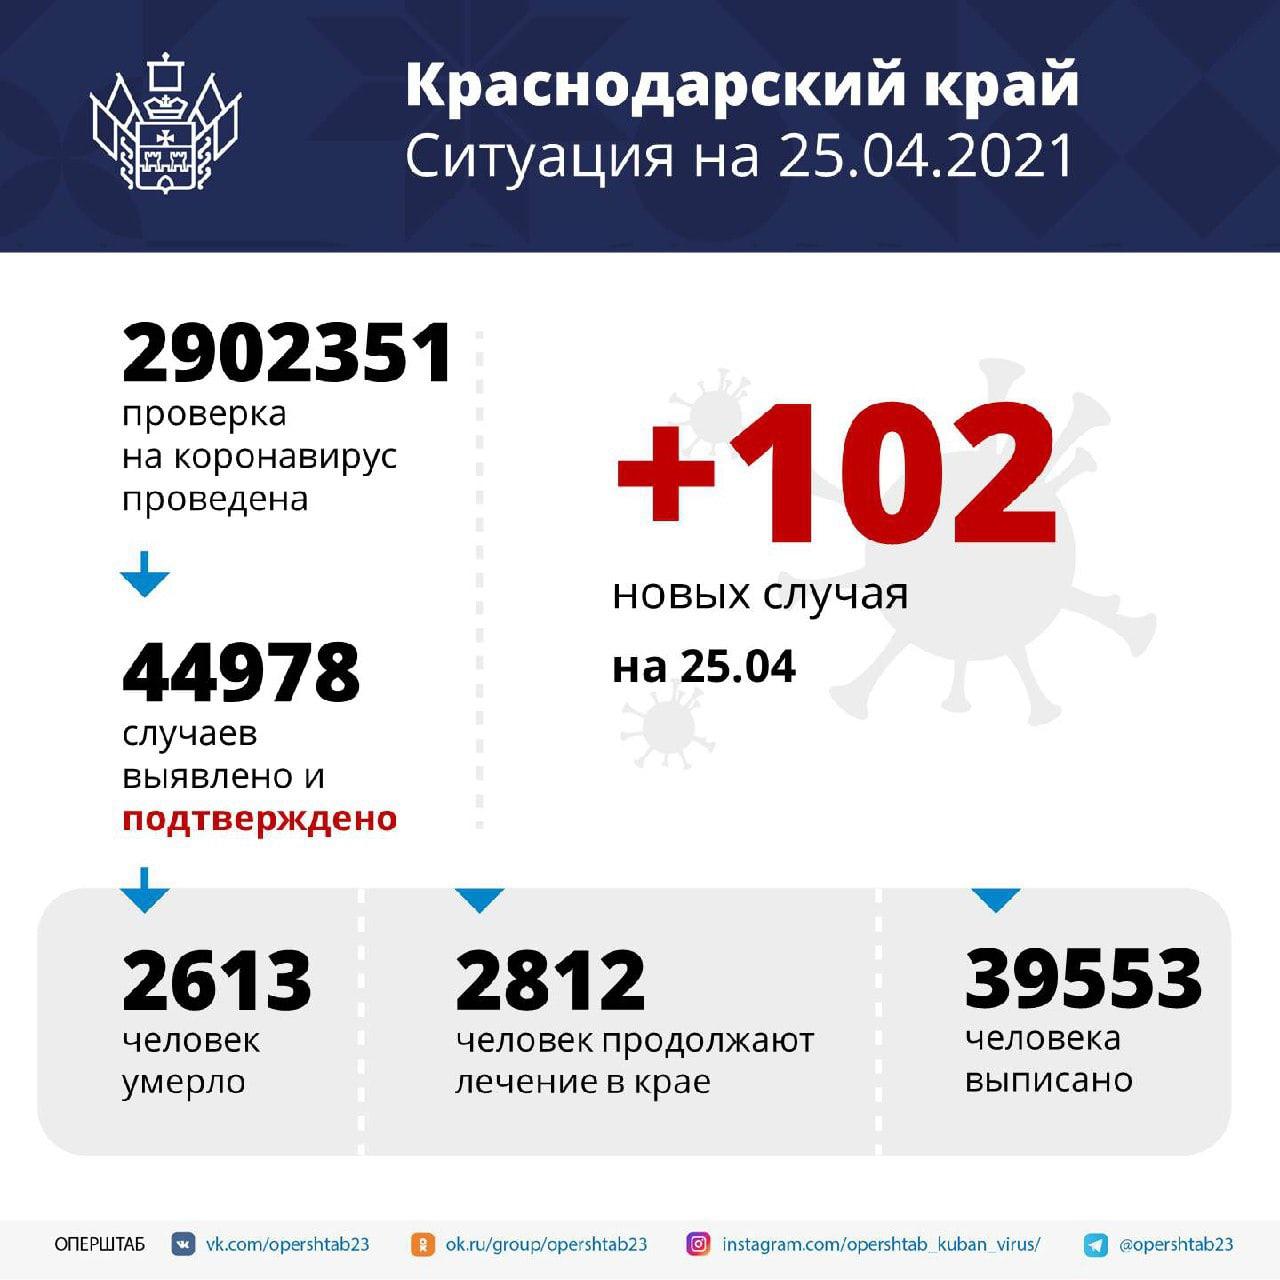 В регионе зарегистрировали 102 заболевших COVID-19За минувшие сутки...